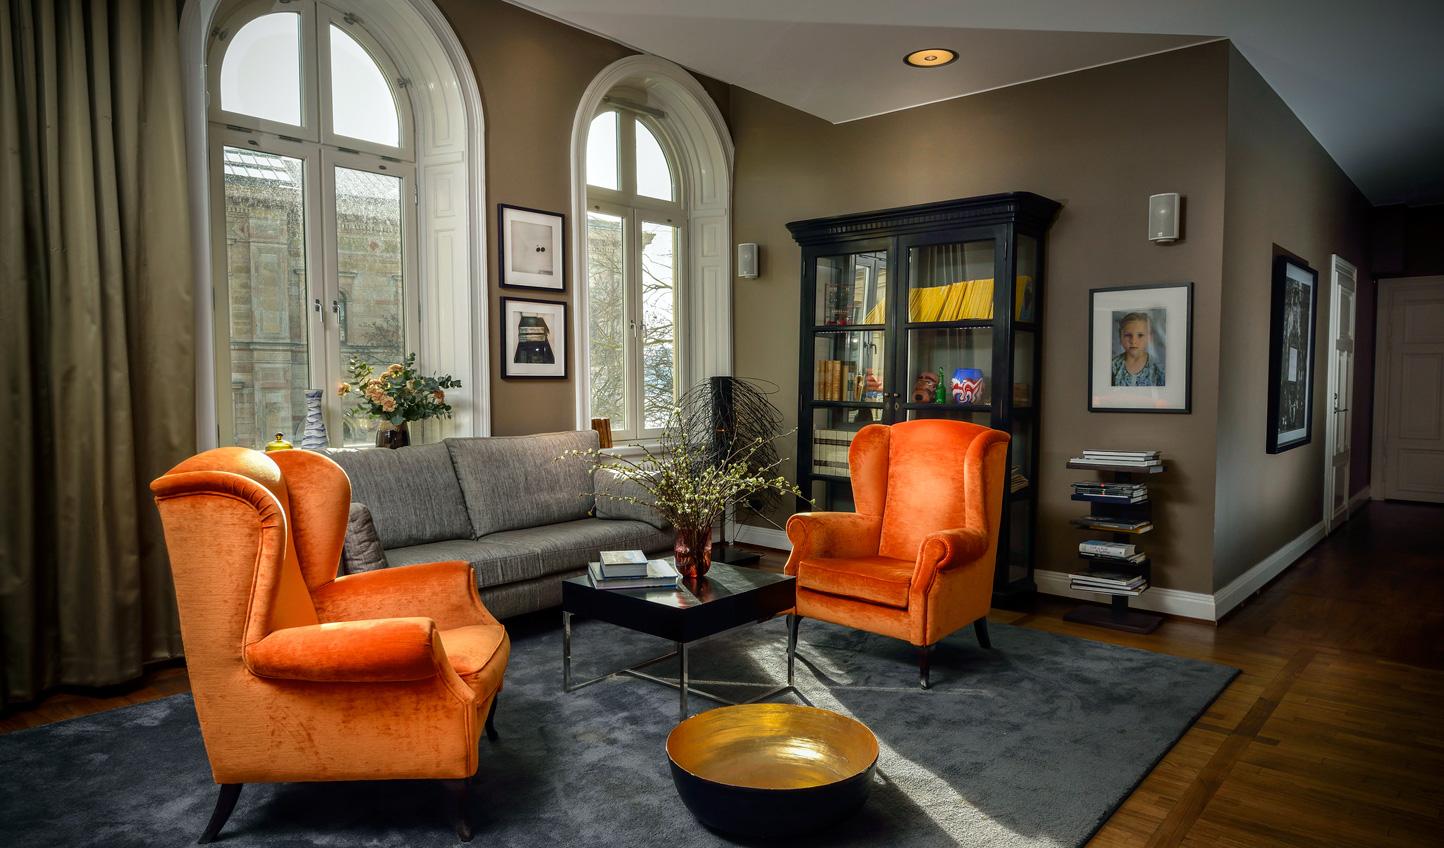 Sleek and stylish rooms